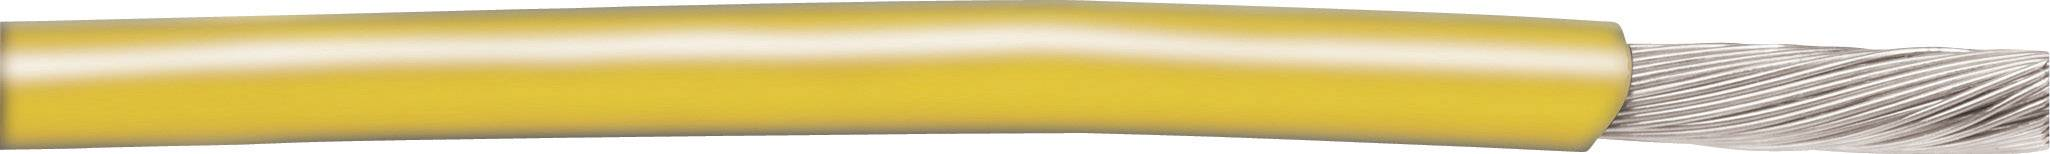 Pletenica 1 x 0.20 mm, bela AlphaWire 6822 30.5 m